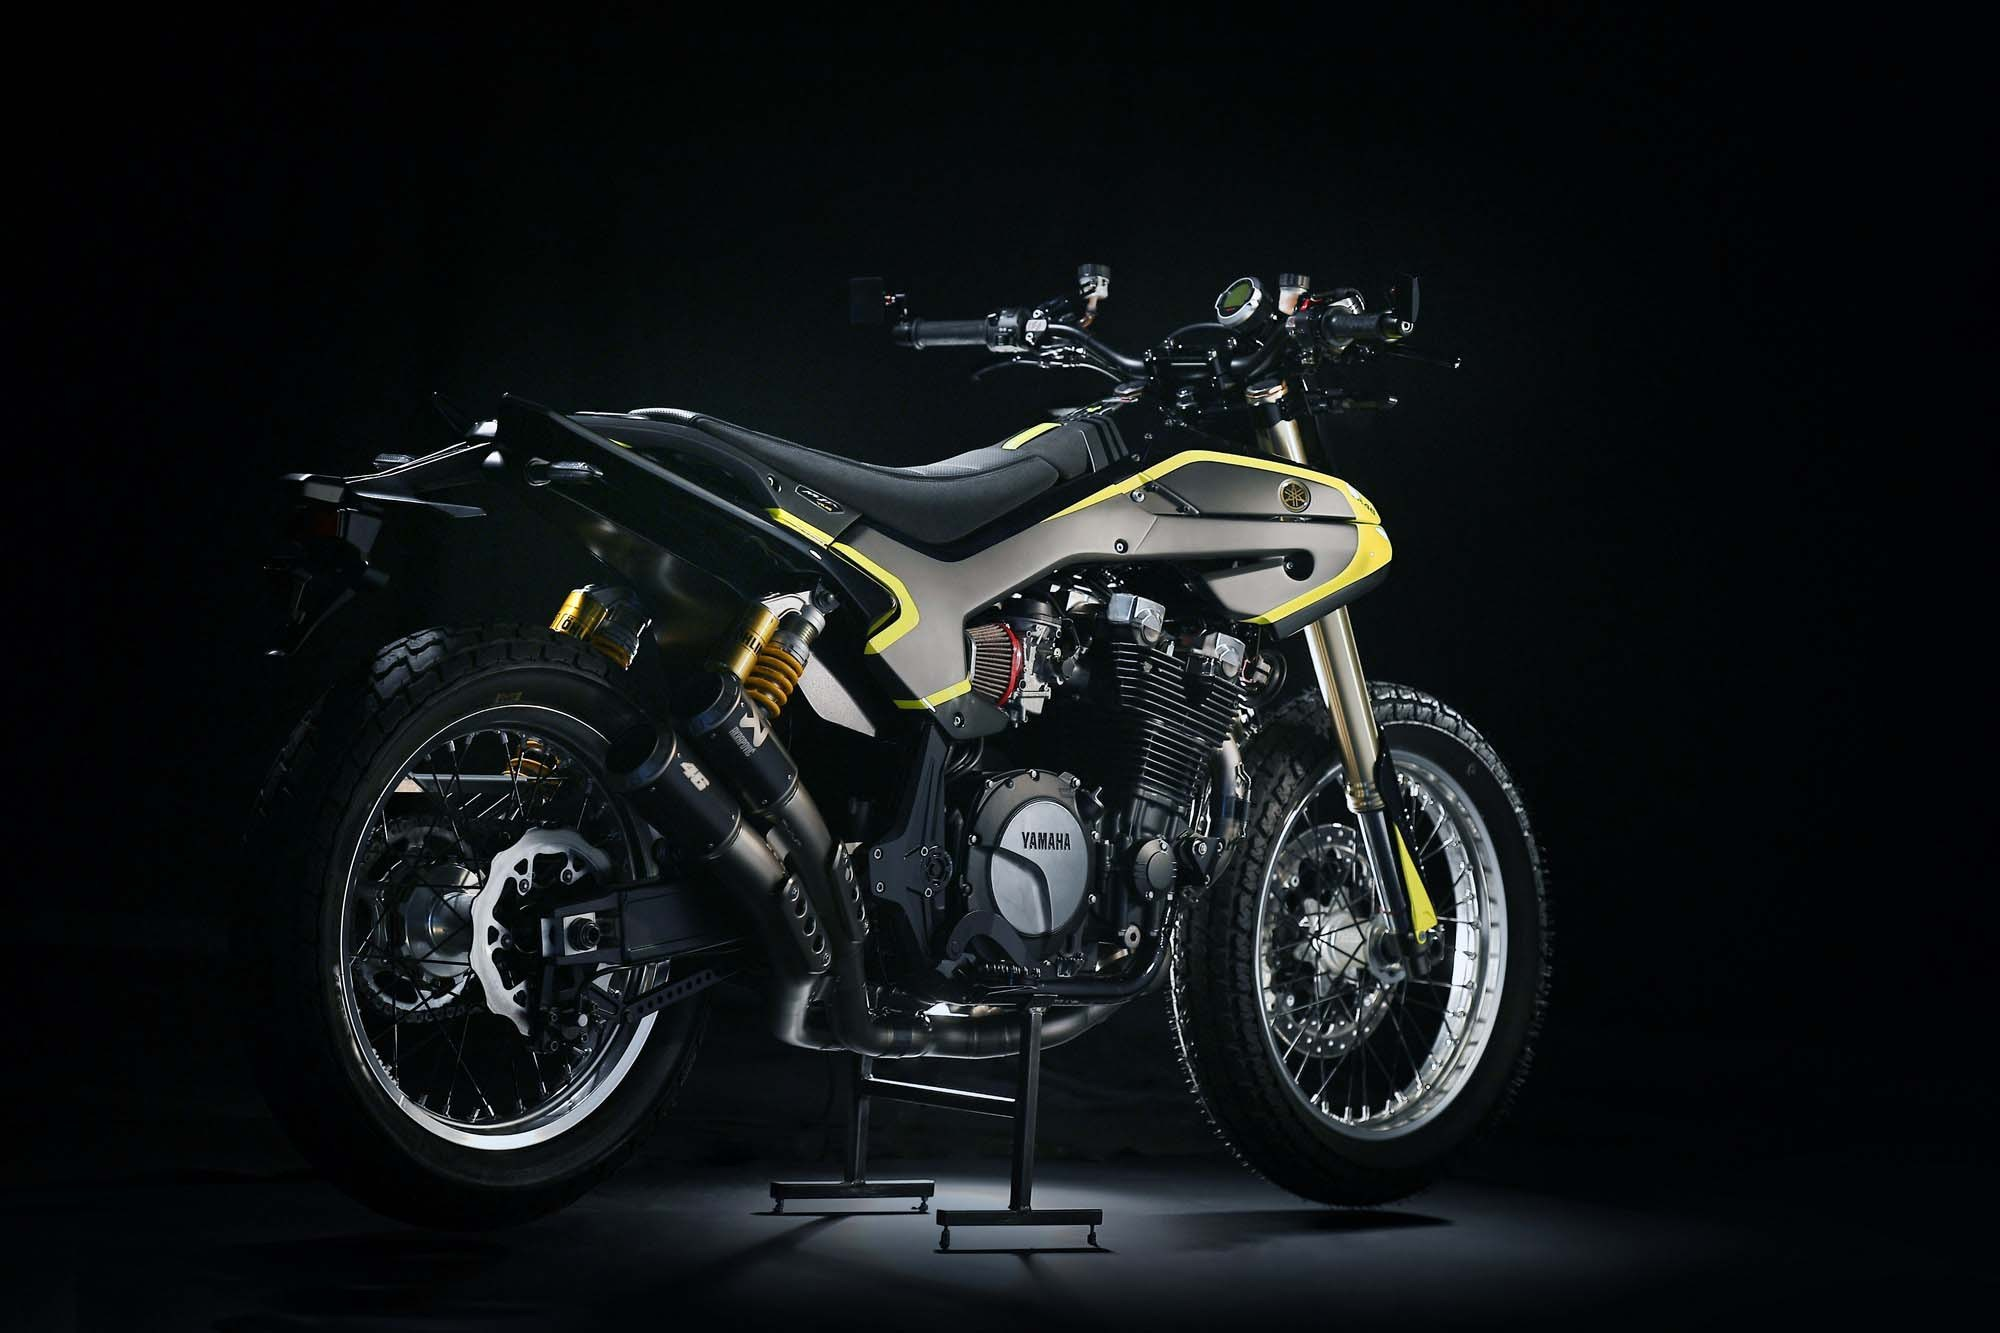 Valentino rossi gets yamaha xjr1300 and it s mya image for Autokraft motors las vegas